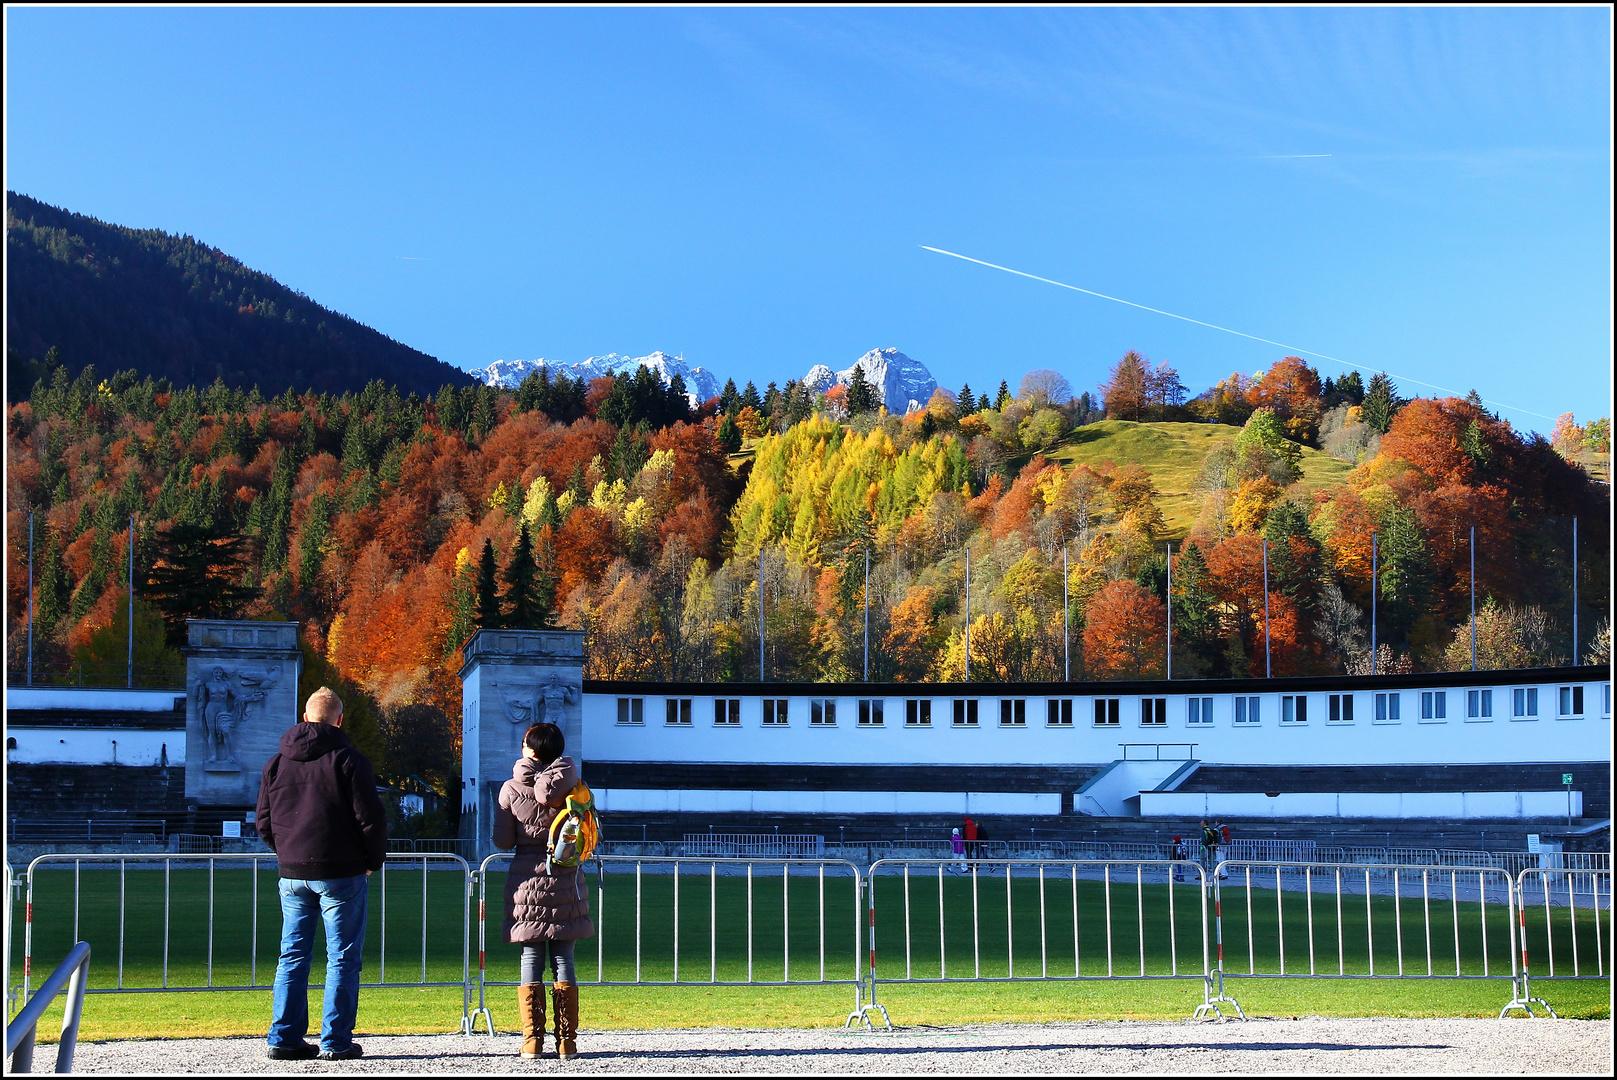 Zugspitzblick am 31. 10. 2011